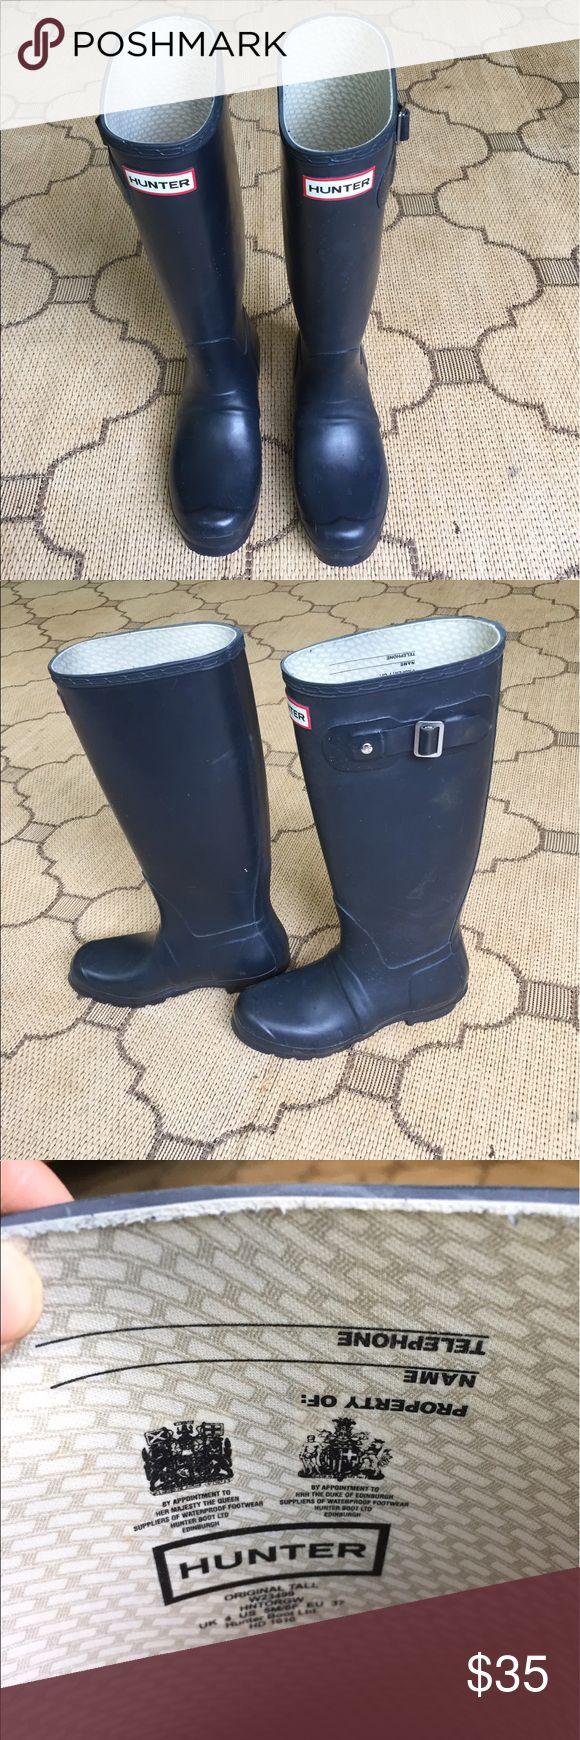 Navy Hunter Rain Boots Stylish dark navy rain boots. Perfect for Coachella, hurricanes and blizzards. Hunter Boots Shoes Winter & Rain Boots